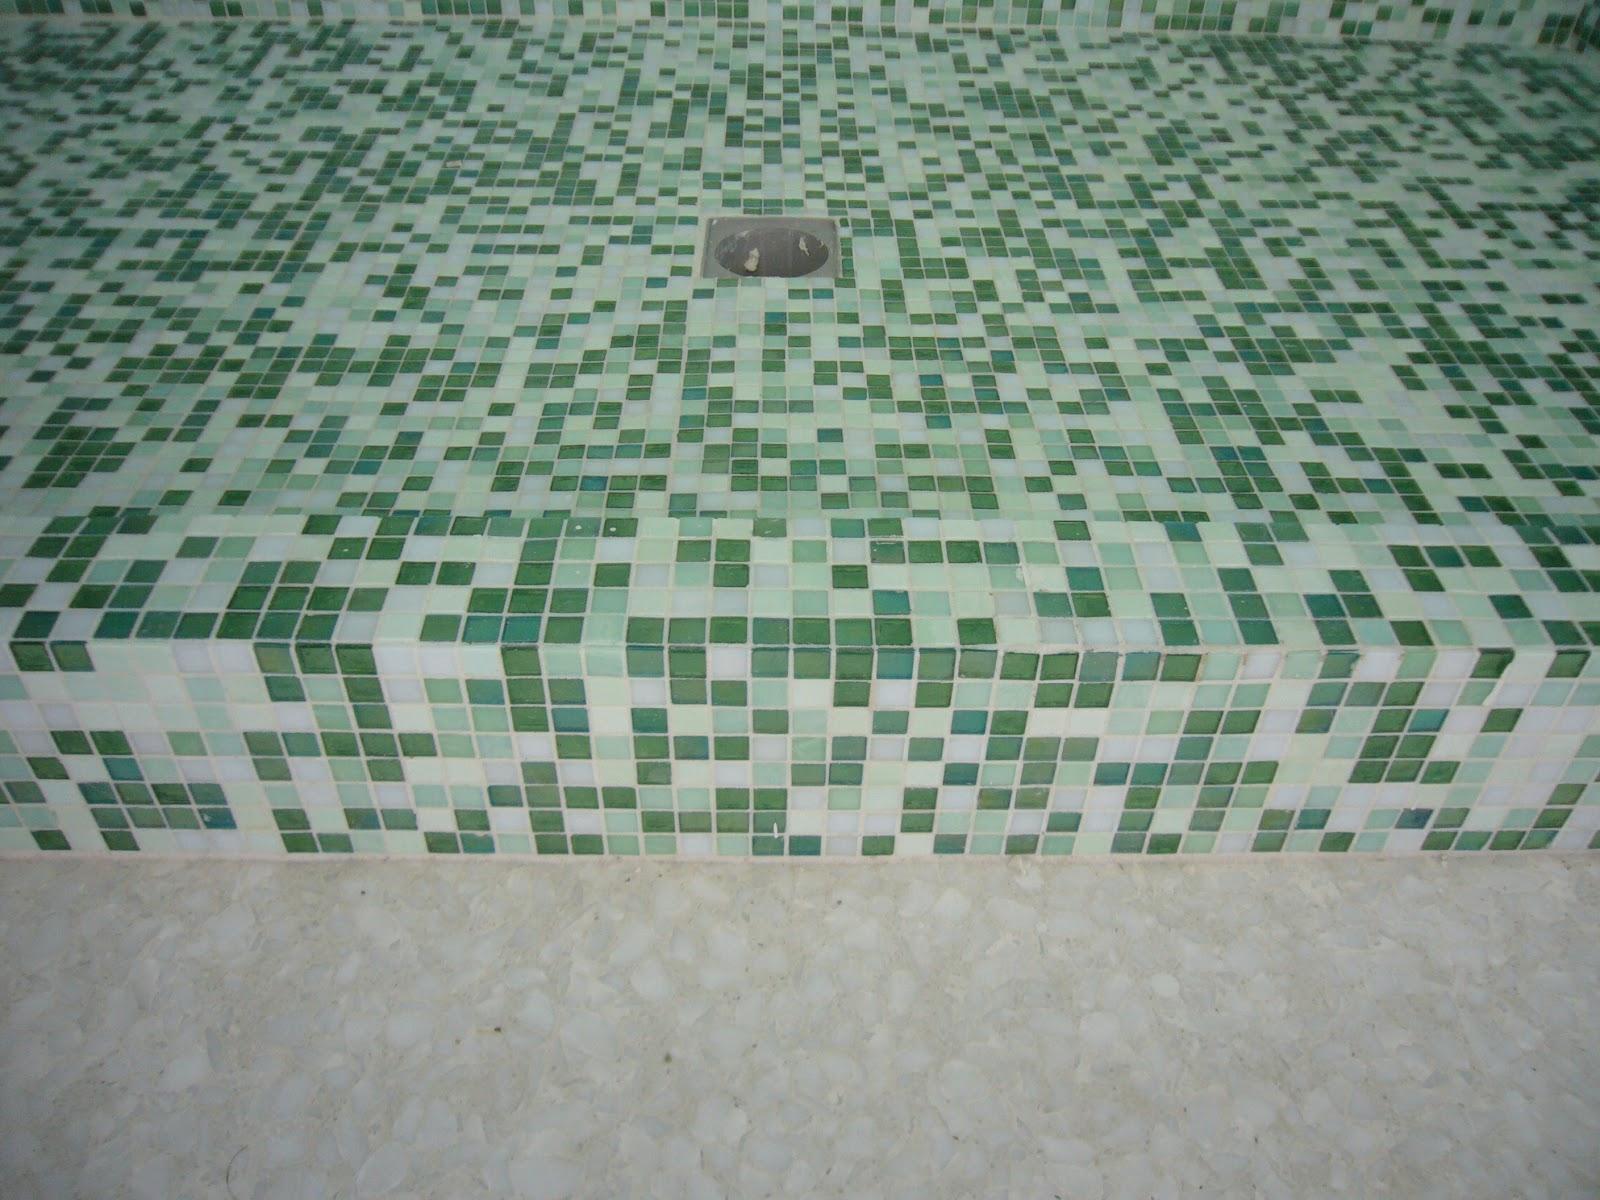 Piastrelle tipo mosaico rivestimento bagno travertino mosaico